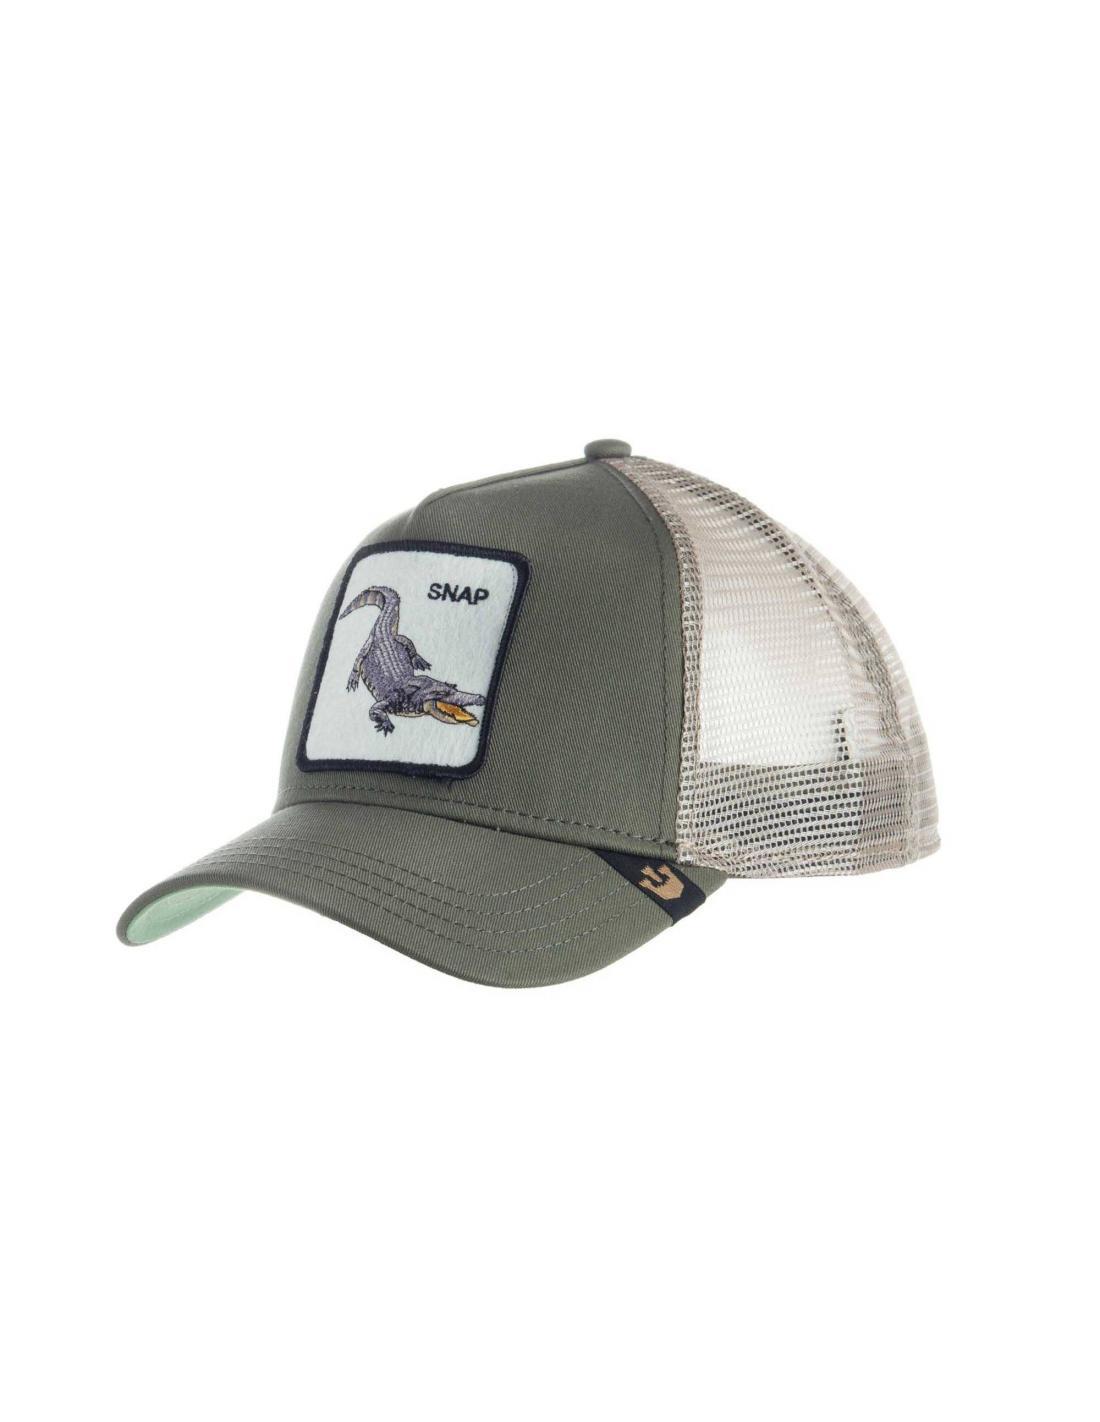 ... Gorra Goorin Snap At Ya Olive Animal Farm Trucker Hat c3877861551